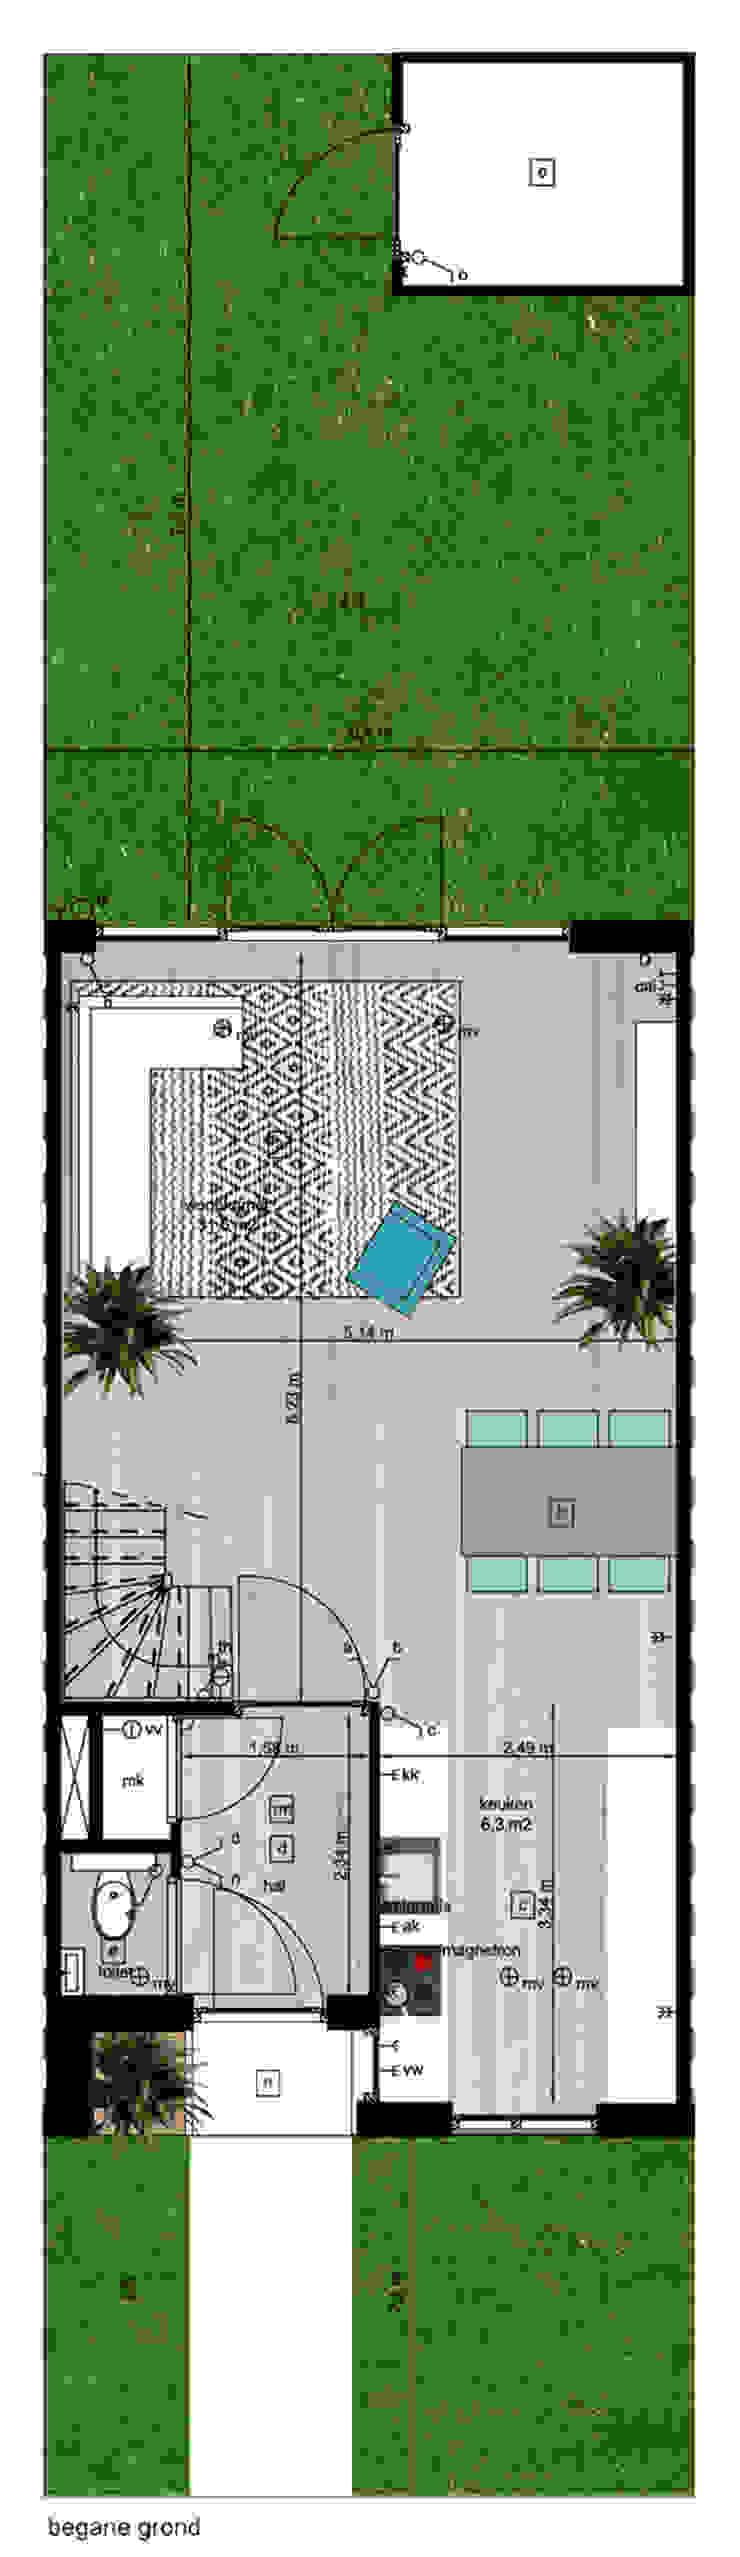 Woning vrije kavel begane grond Moderne huizen van YA Architecten Modern